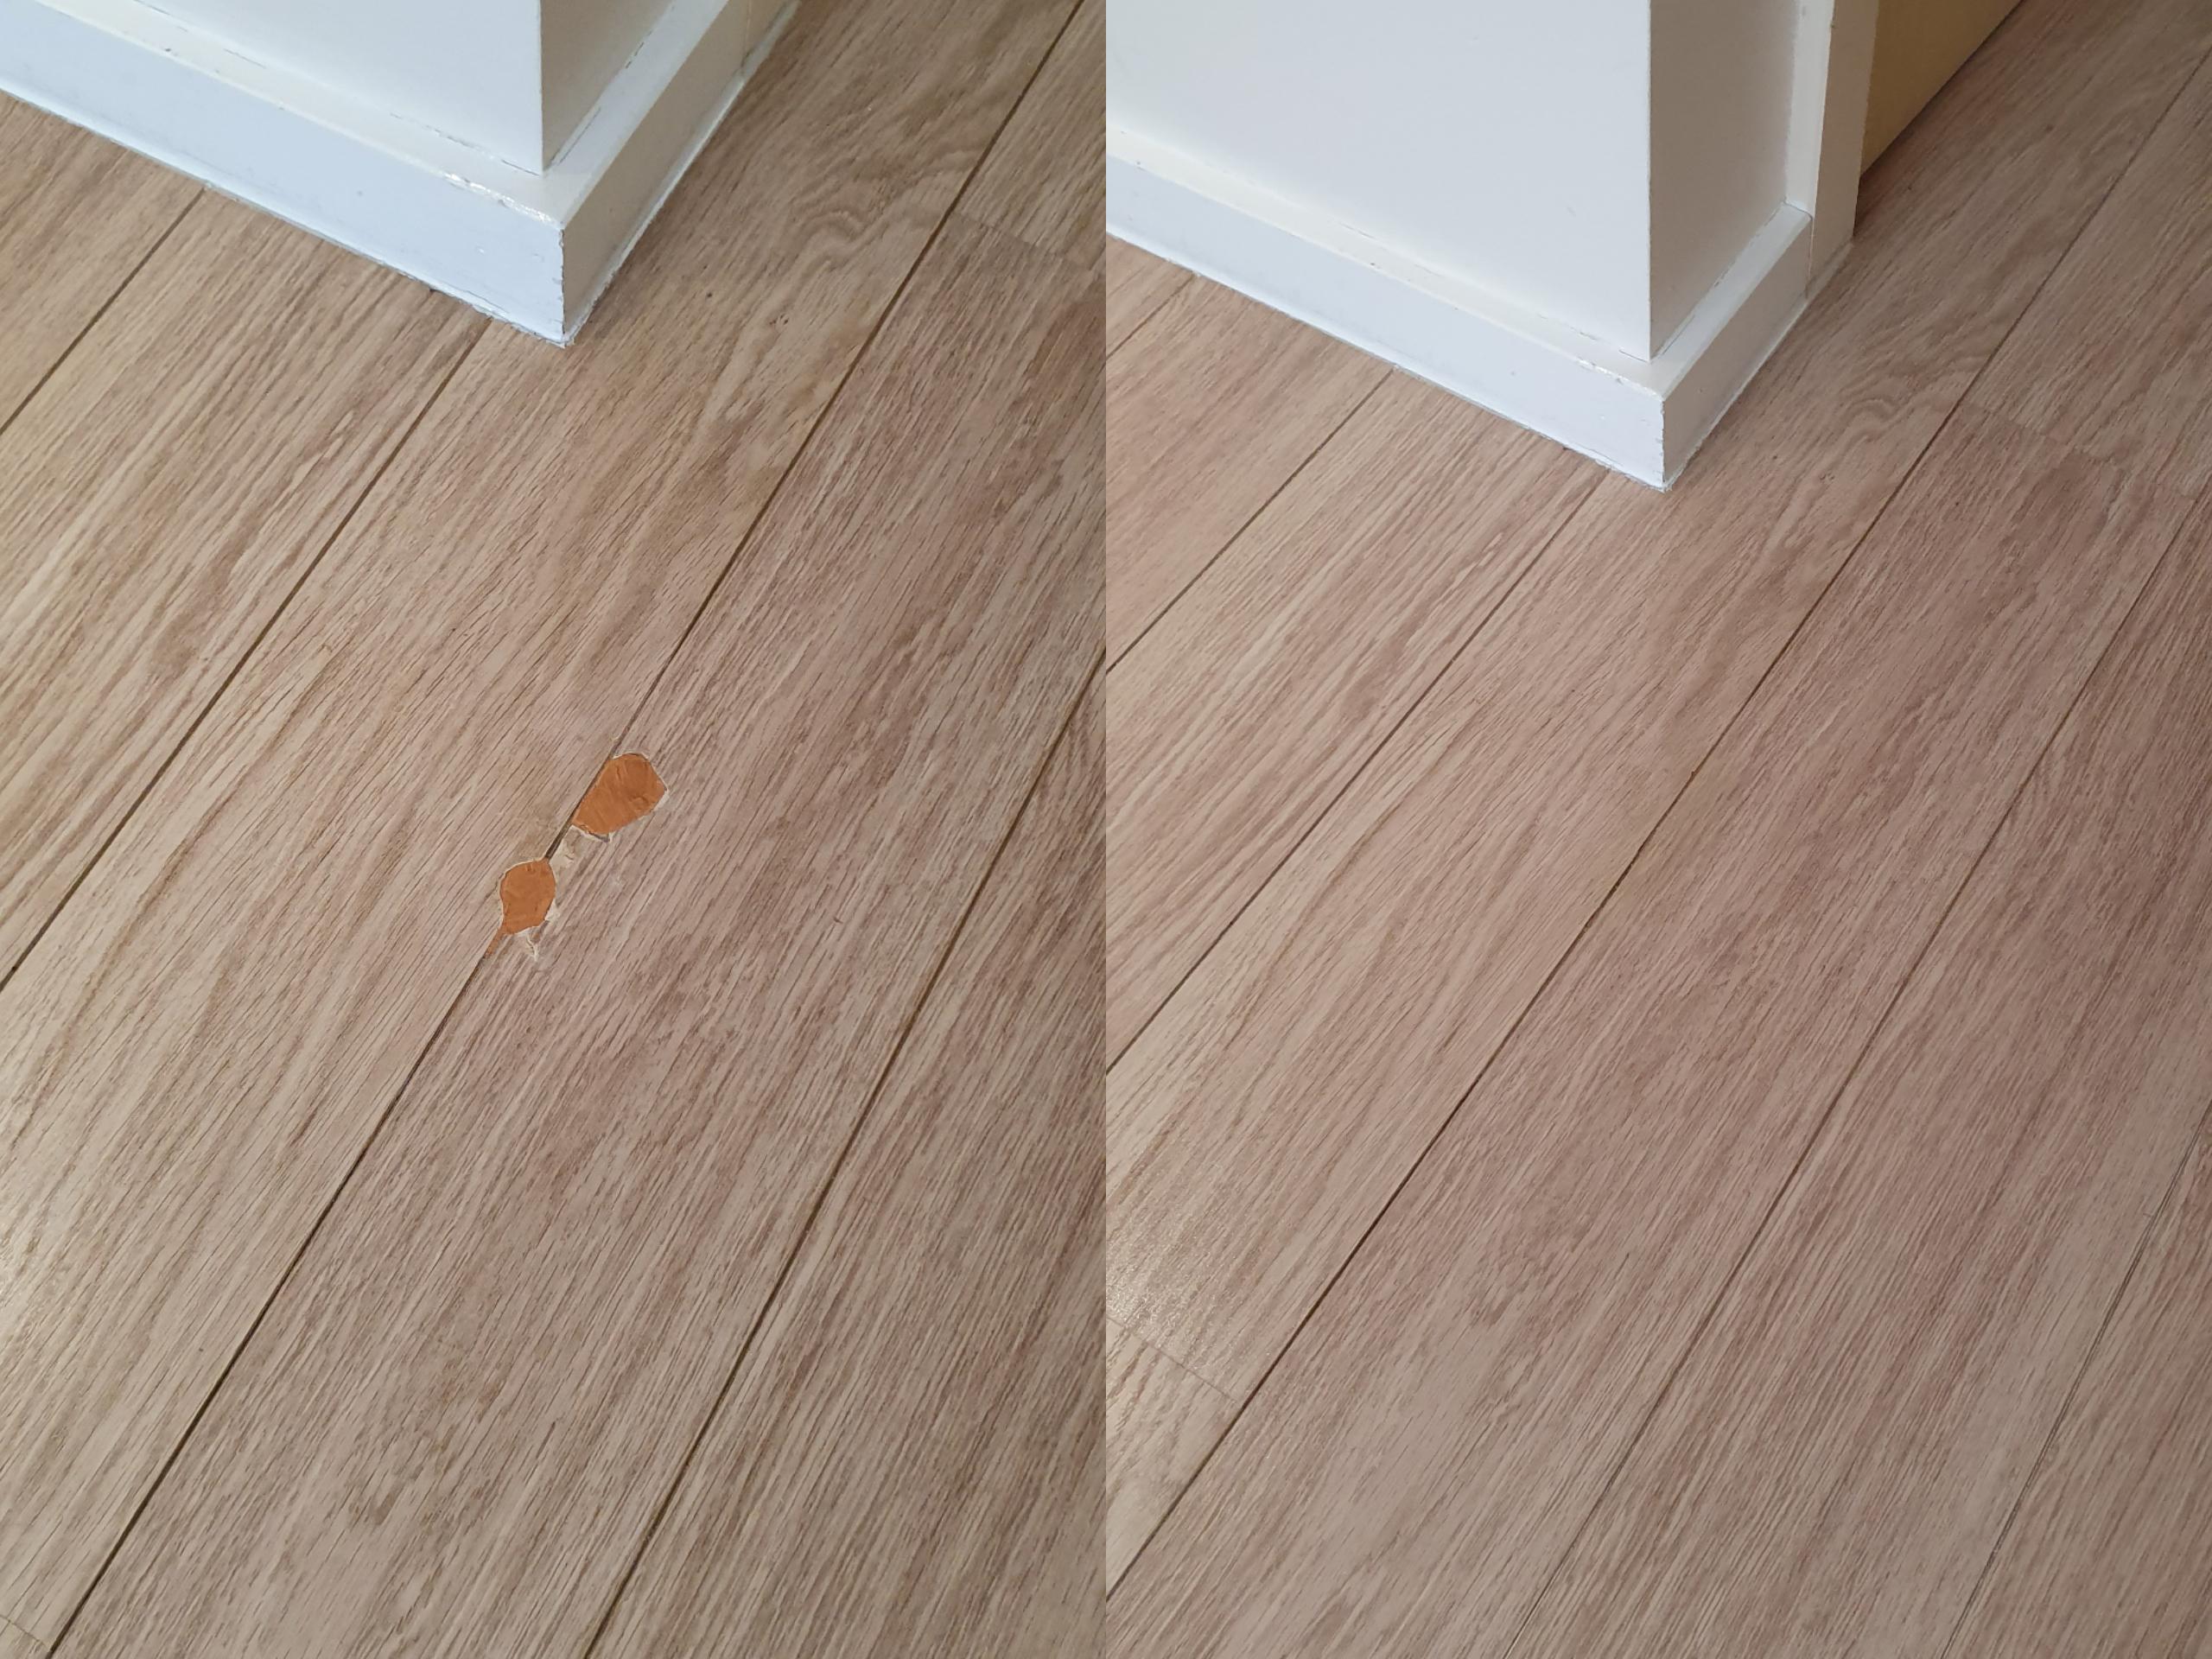 Laminate floor repair before and after